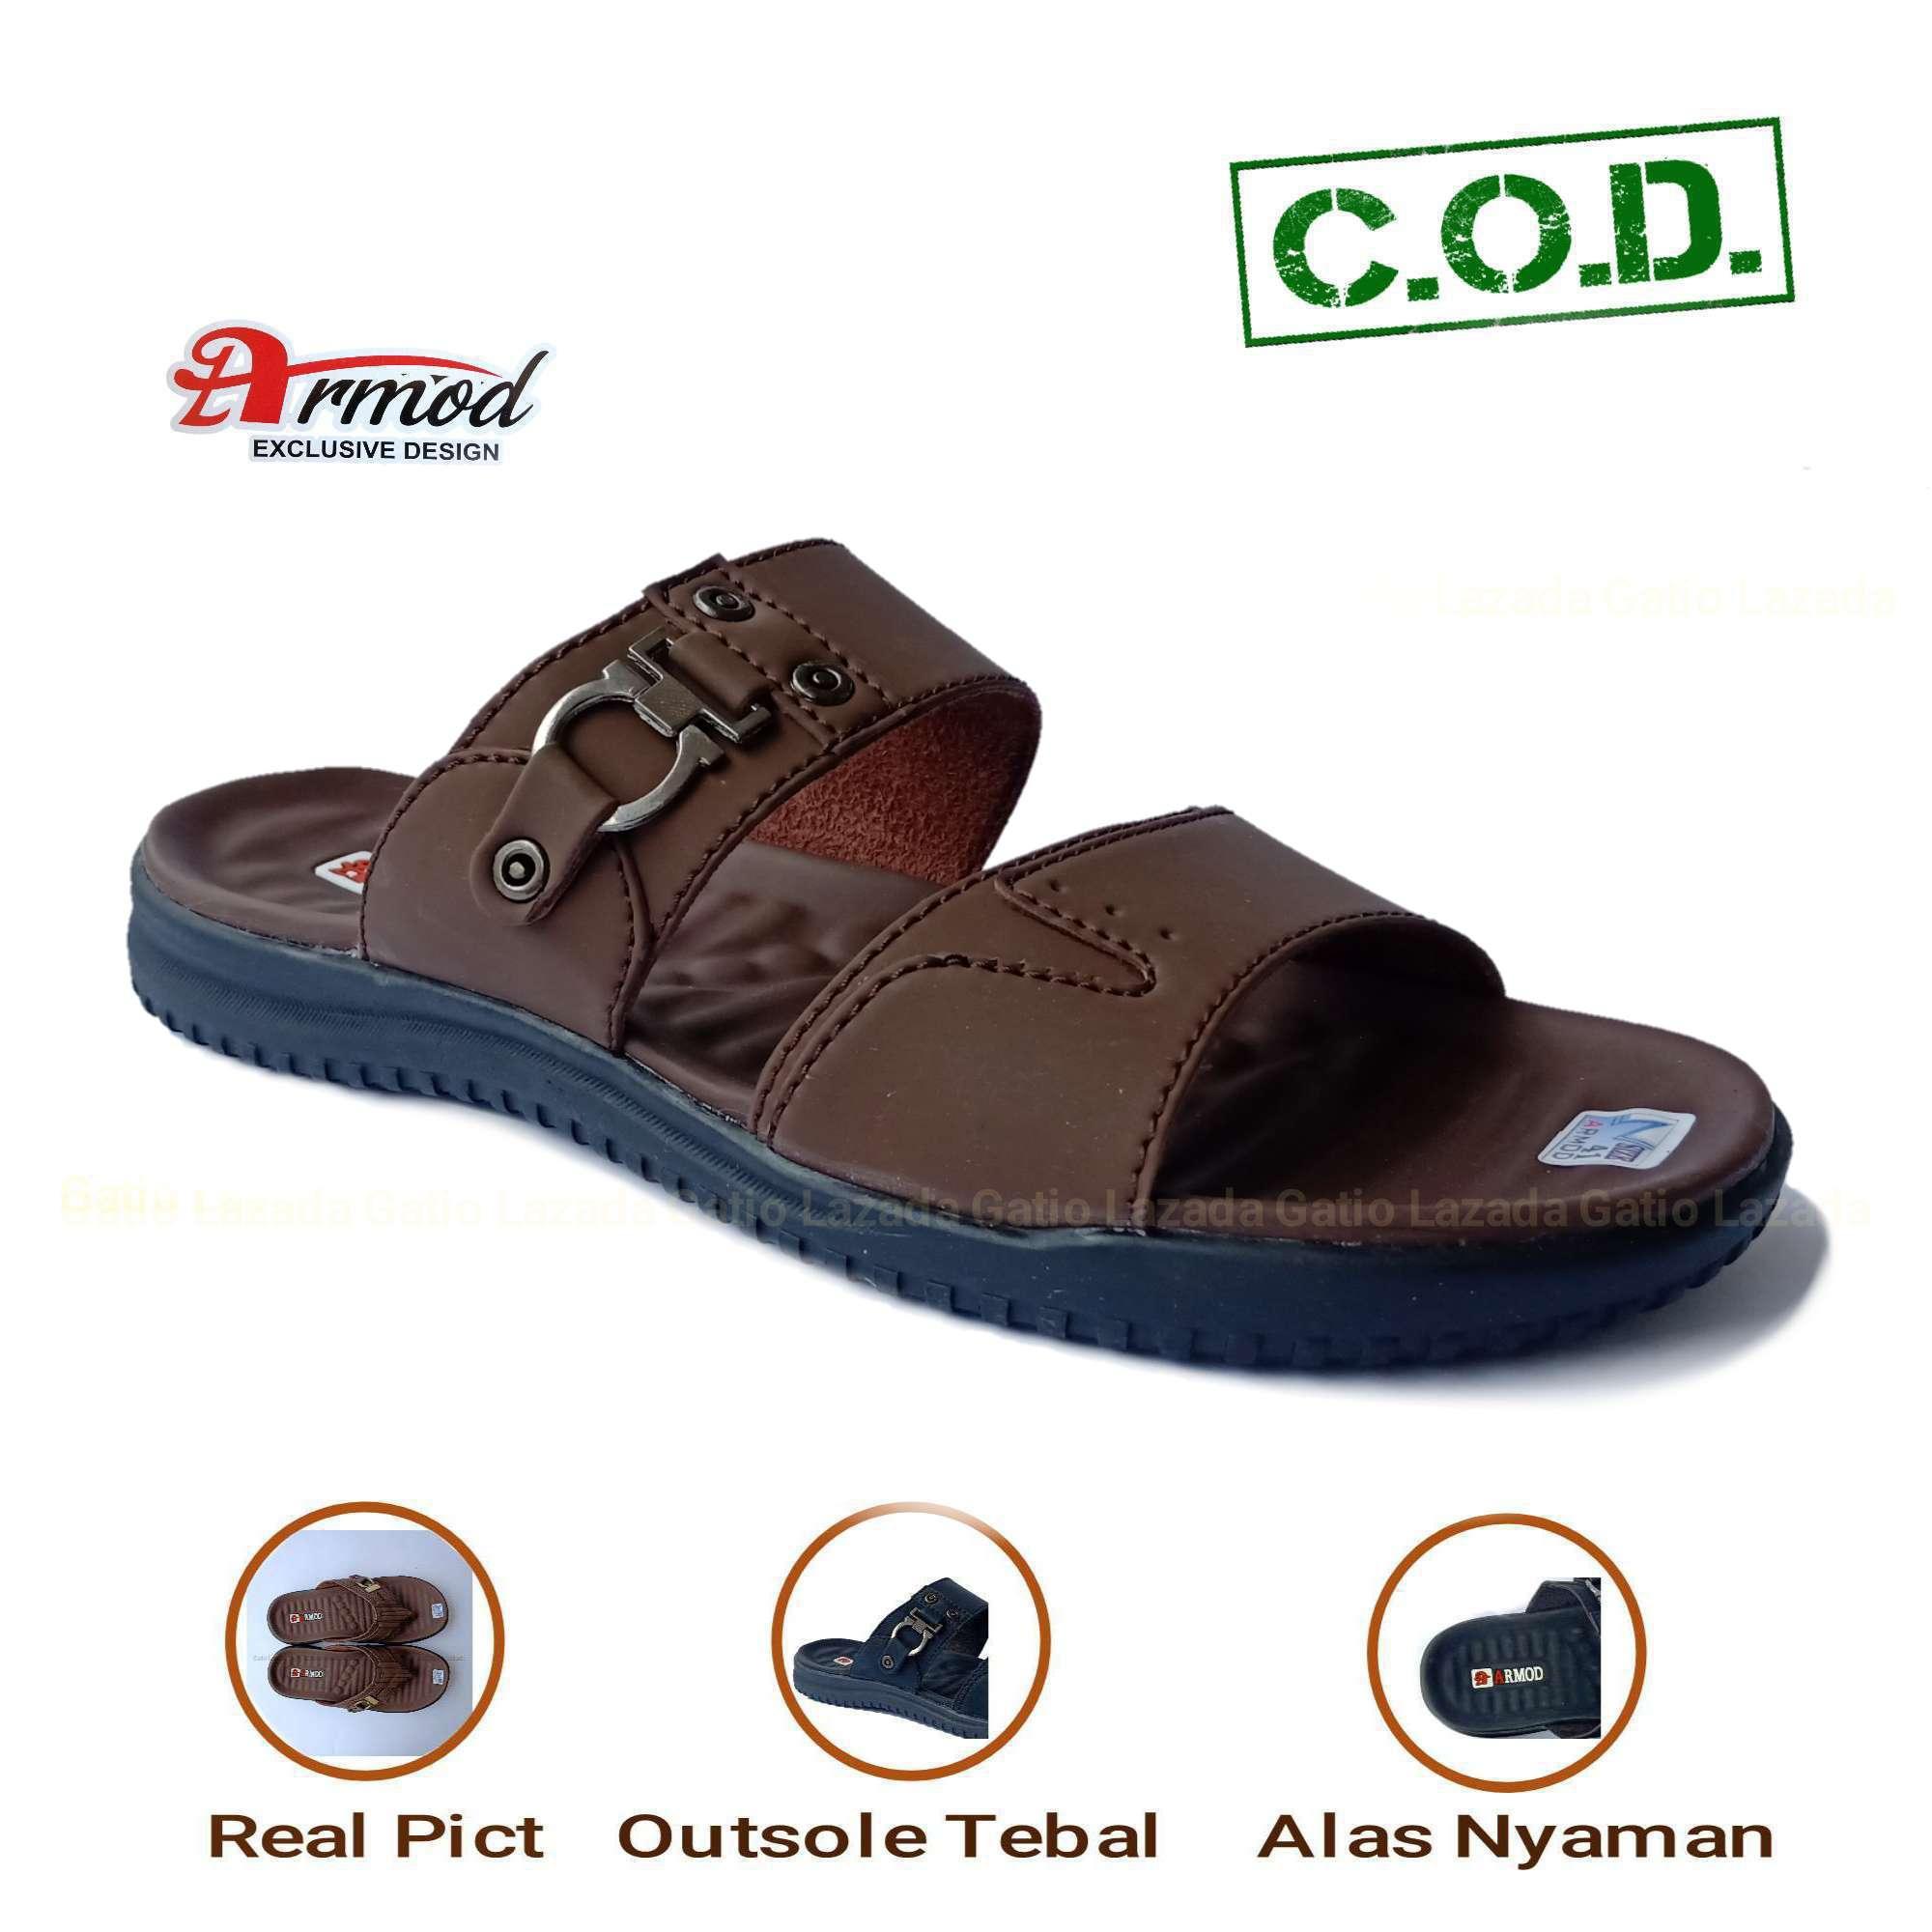 Sandal Kulit   Sandal Pria   Sandal Pria Kulit Casual Sandal Kulit Pria   Sandal  Pria cc079b5e93